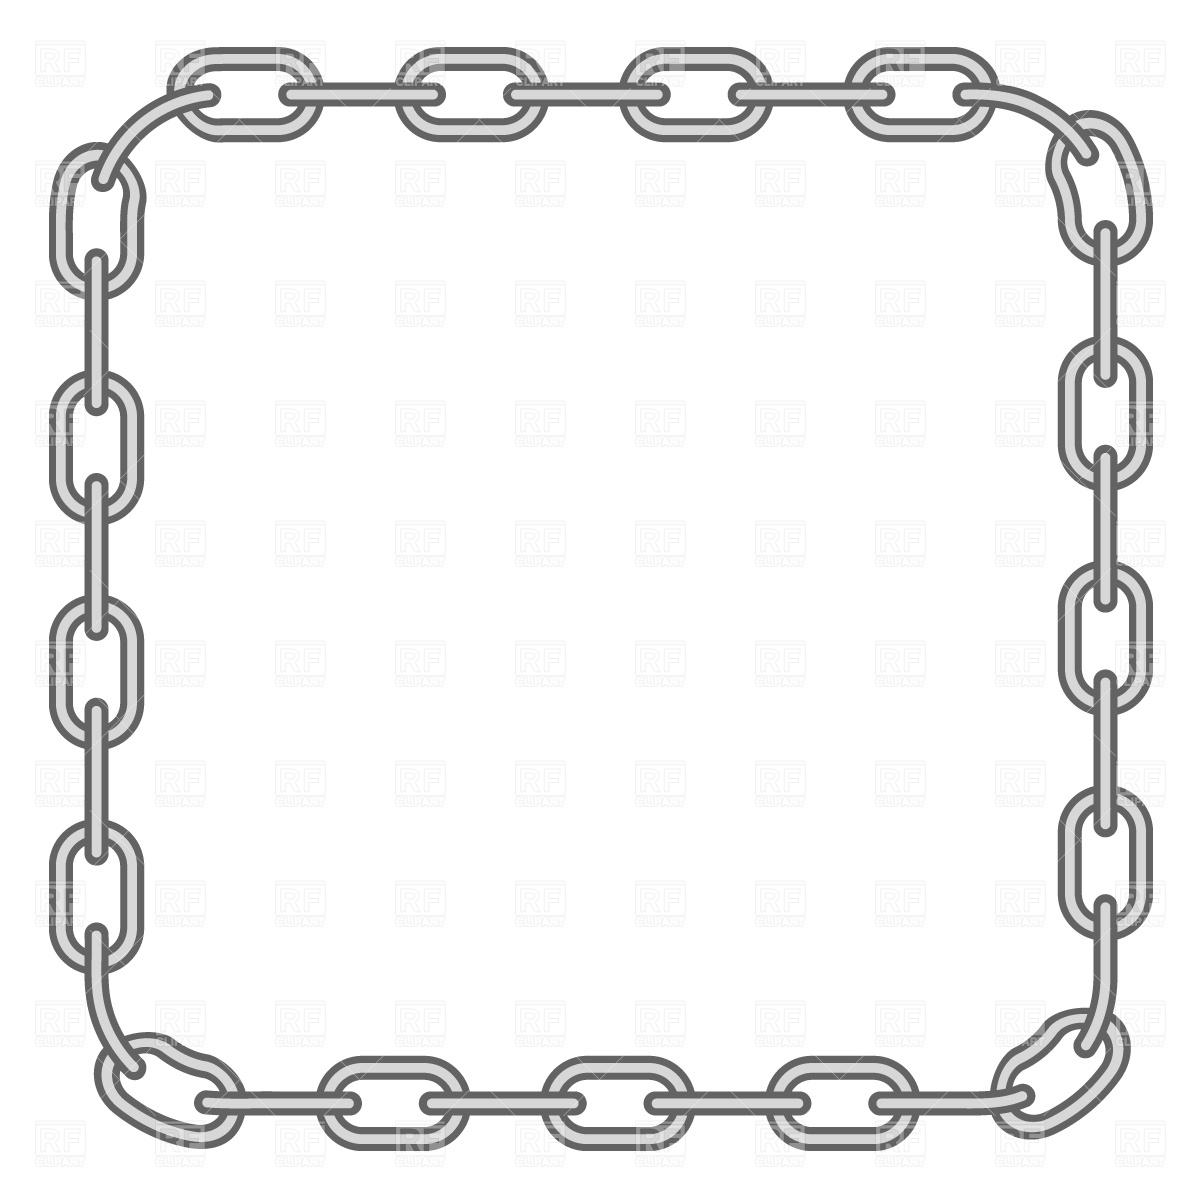 Chain clipart vector Clip Art Cliparts Download Clip